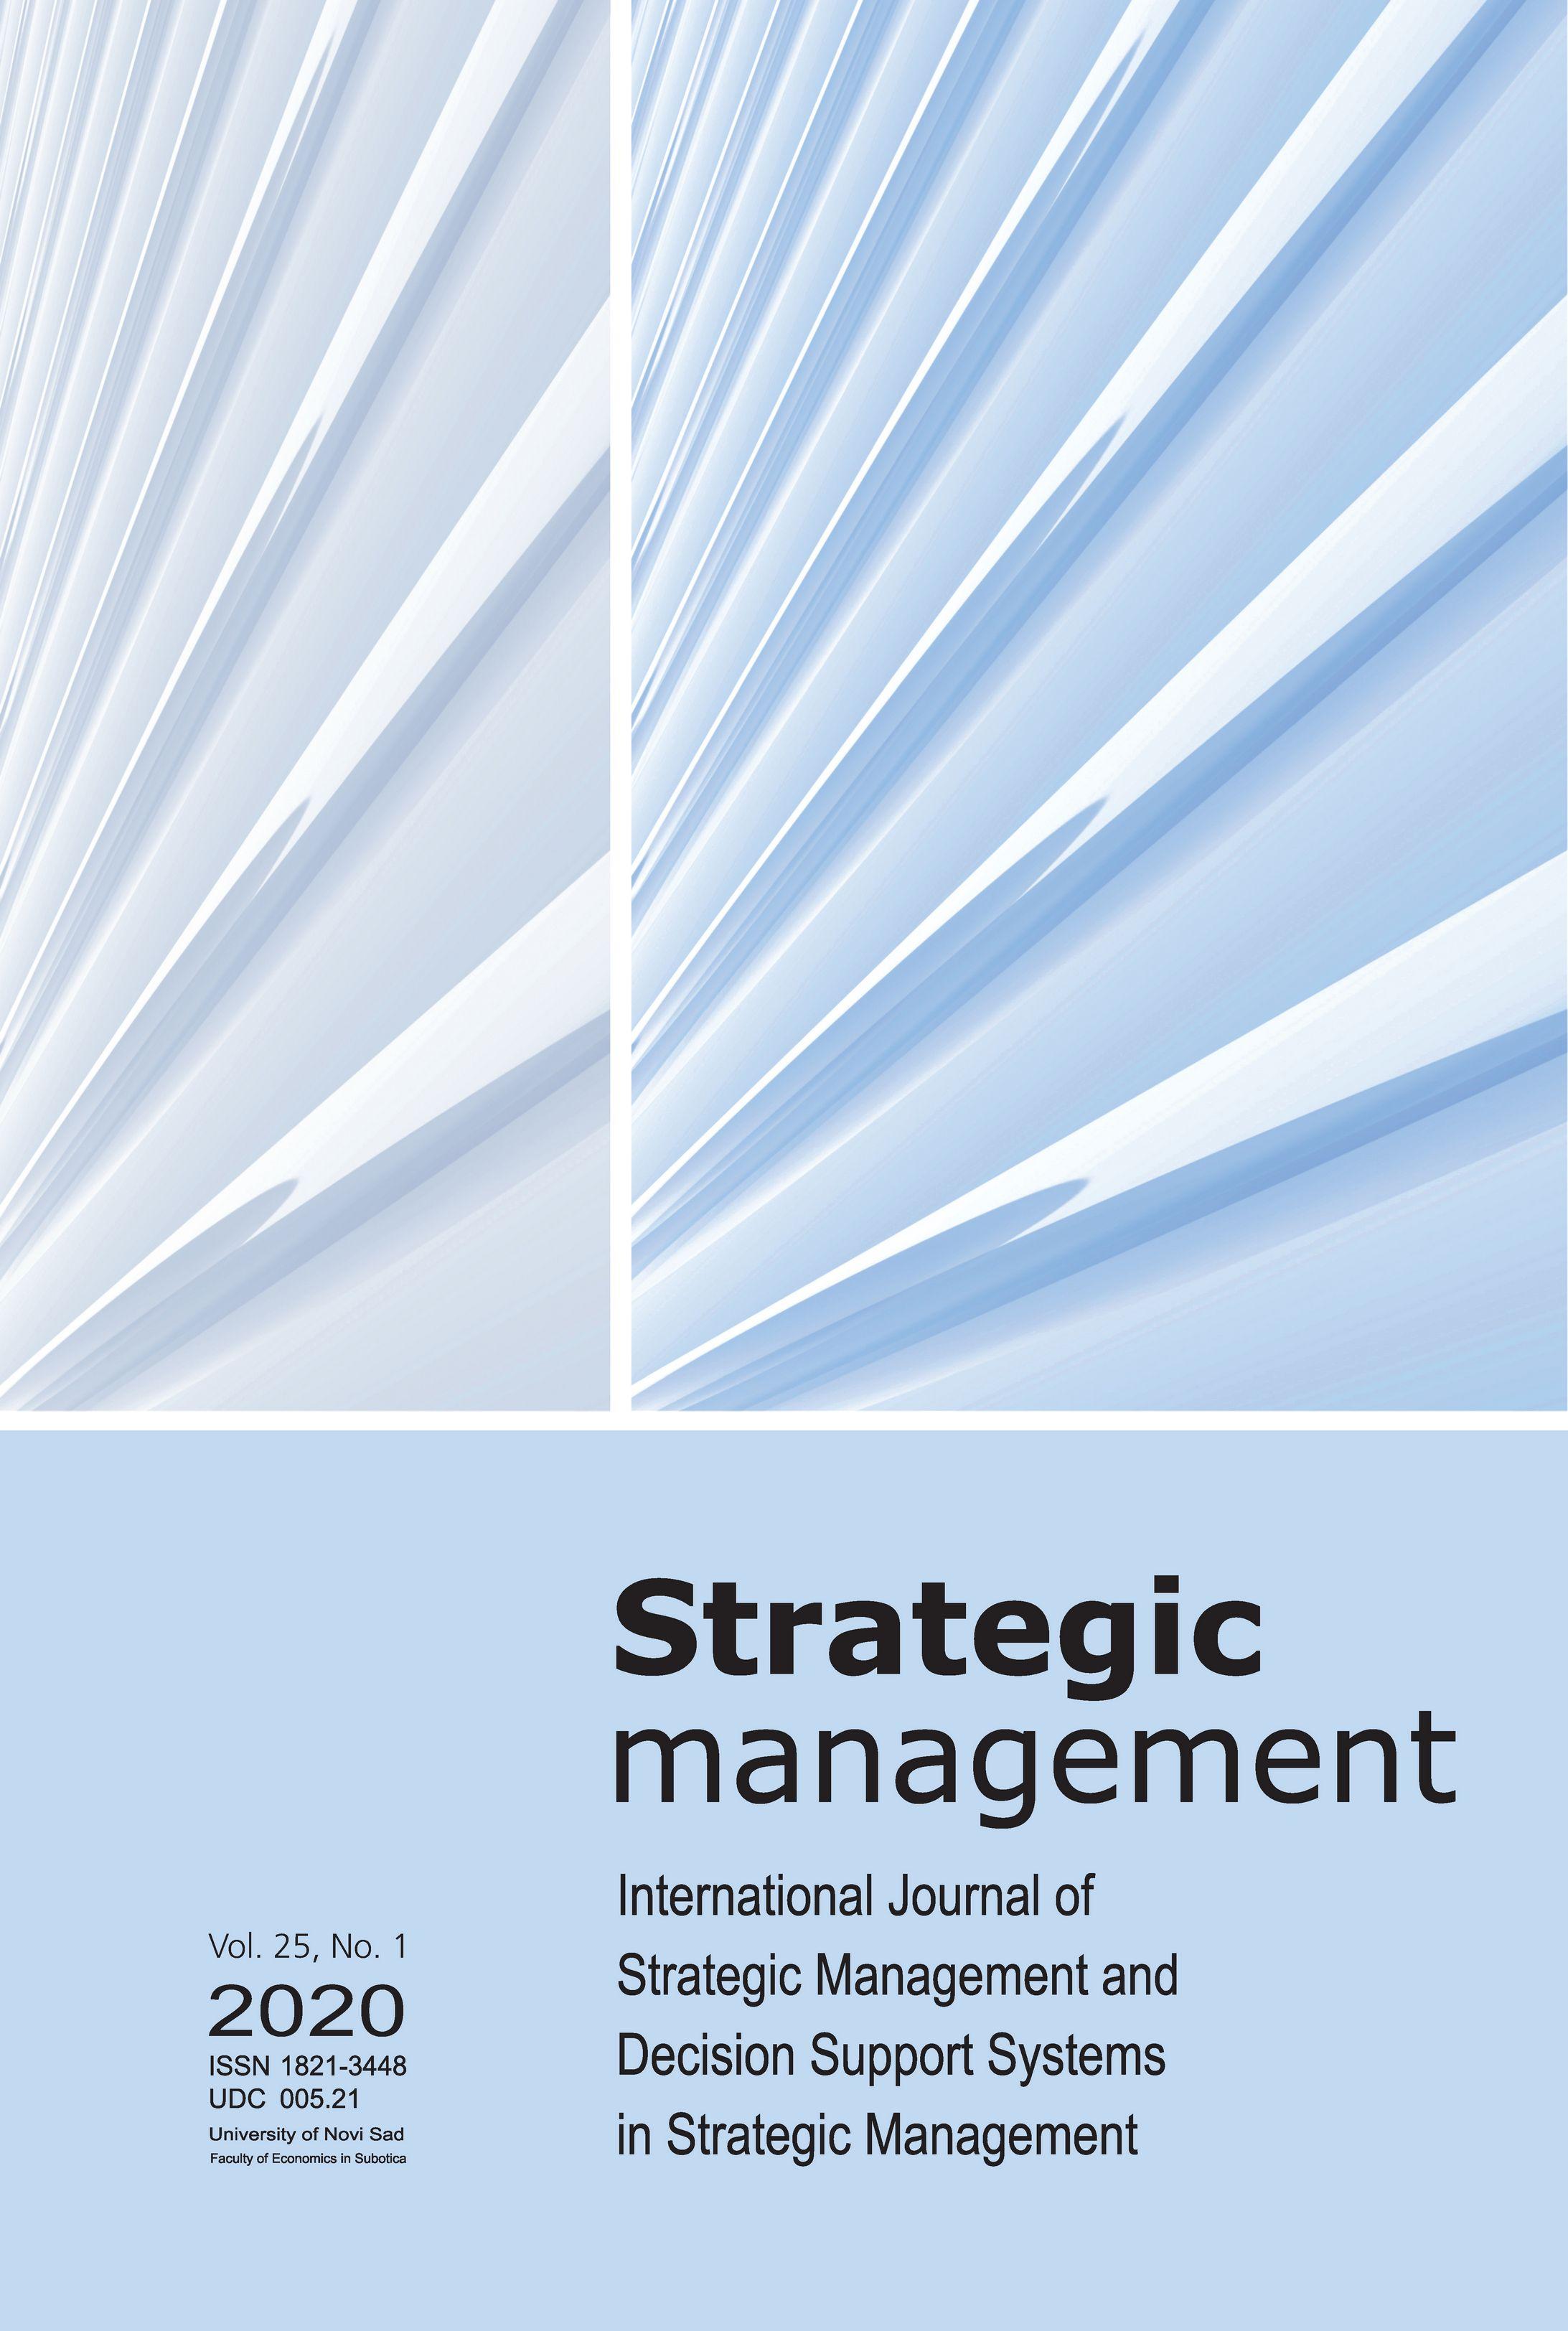 View Vol. 25 No. 1 (2020): Strategic Management